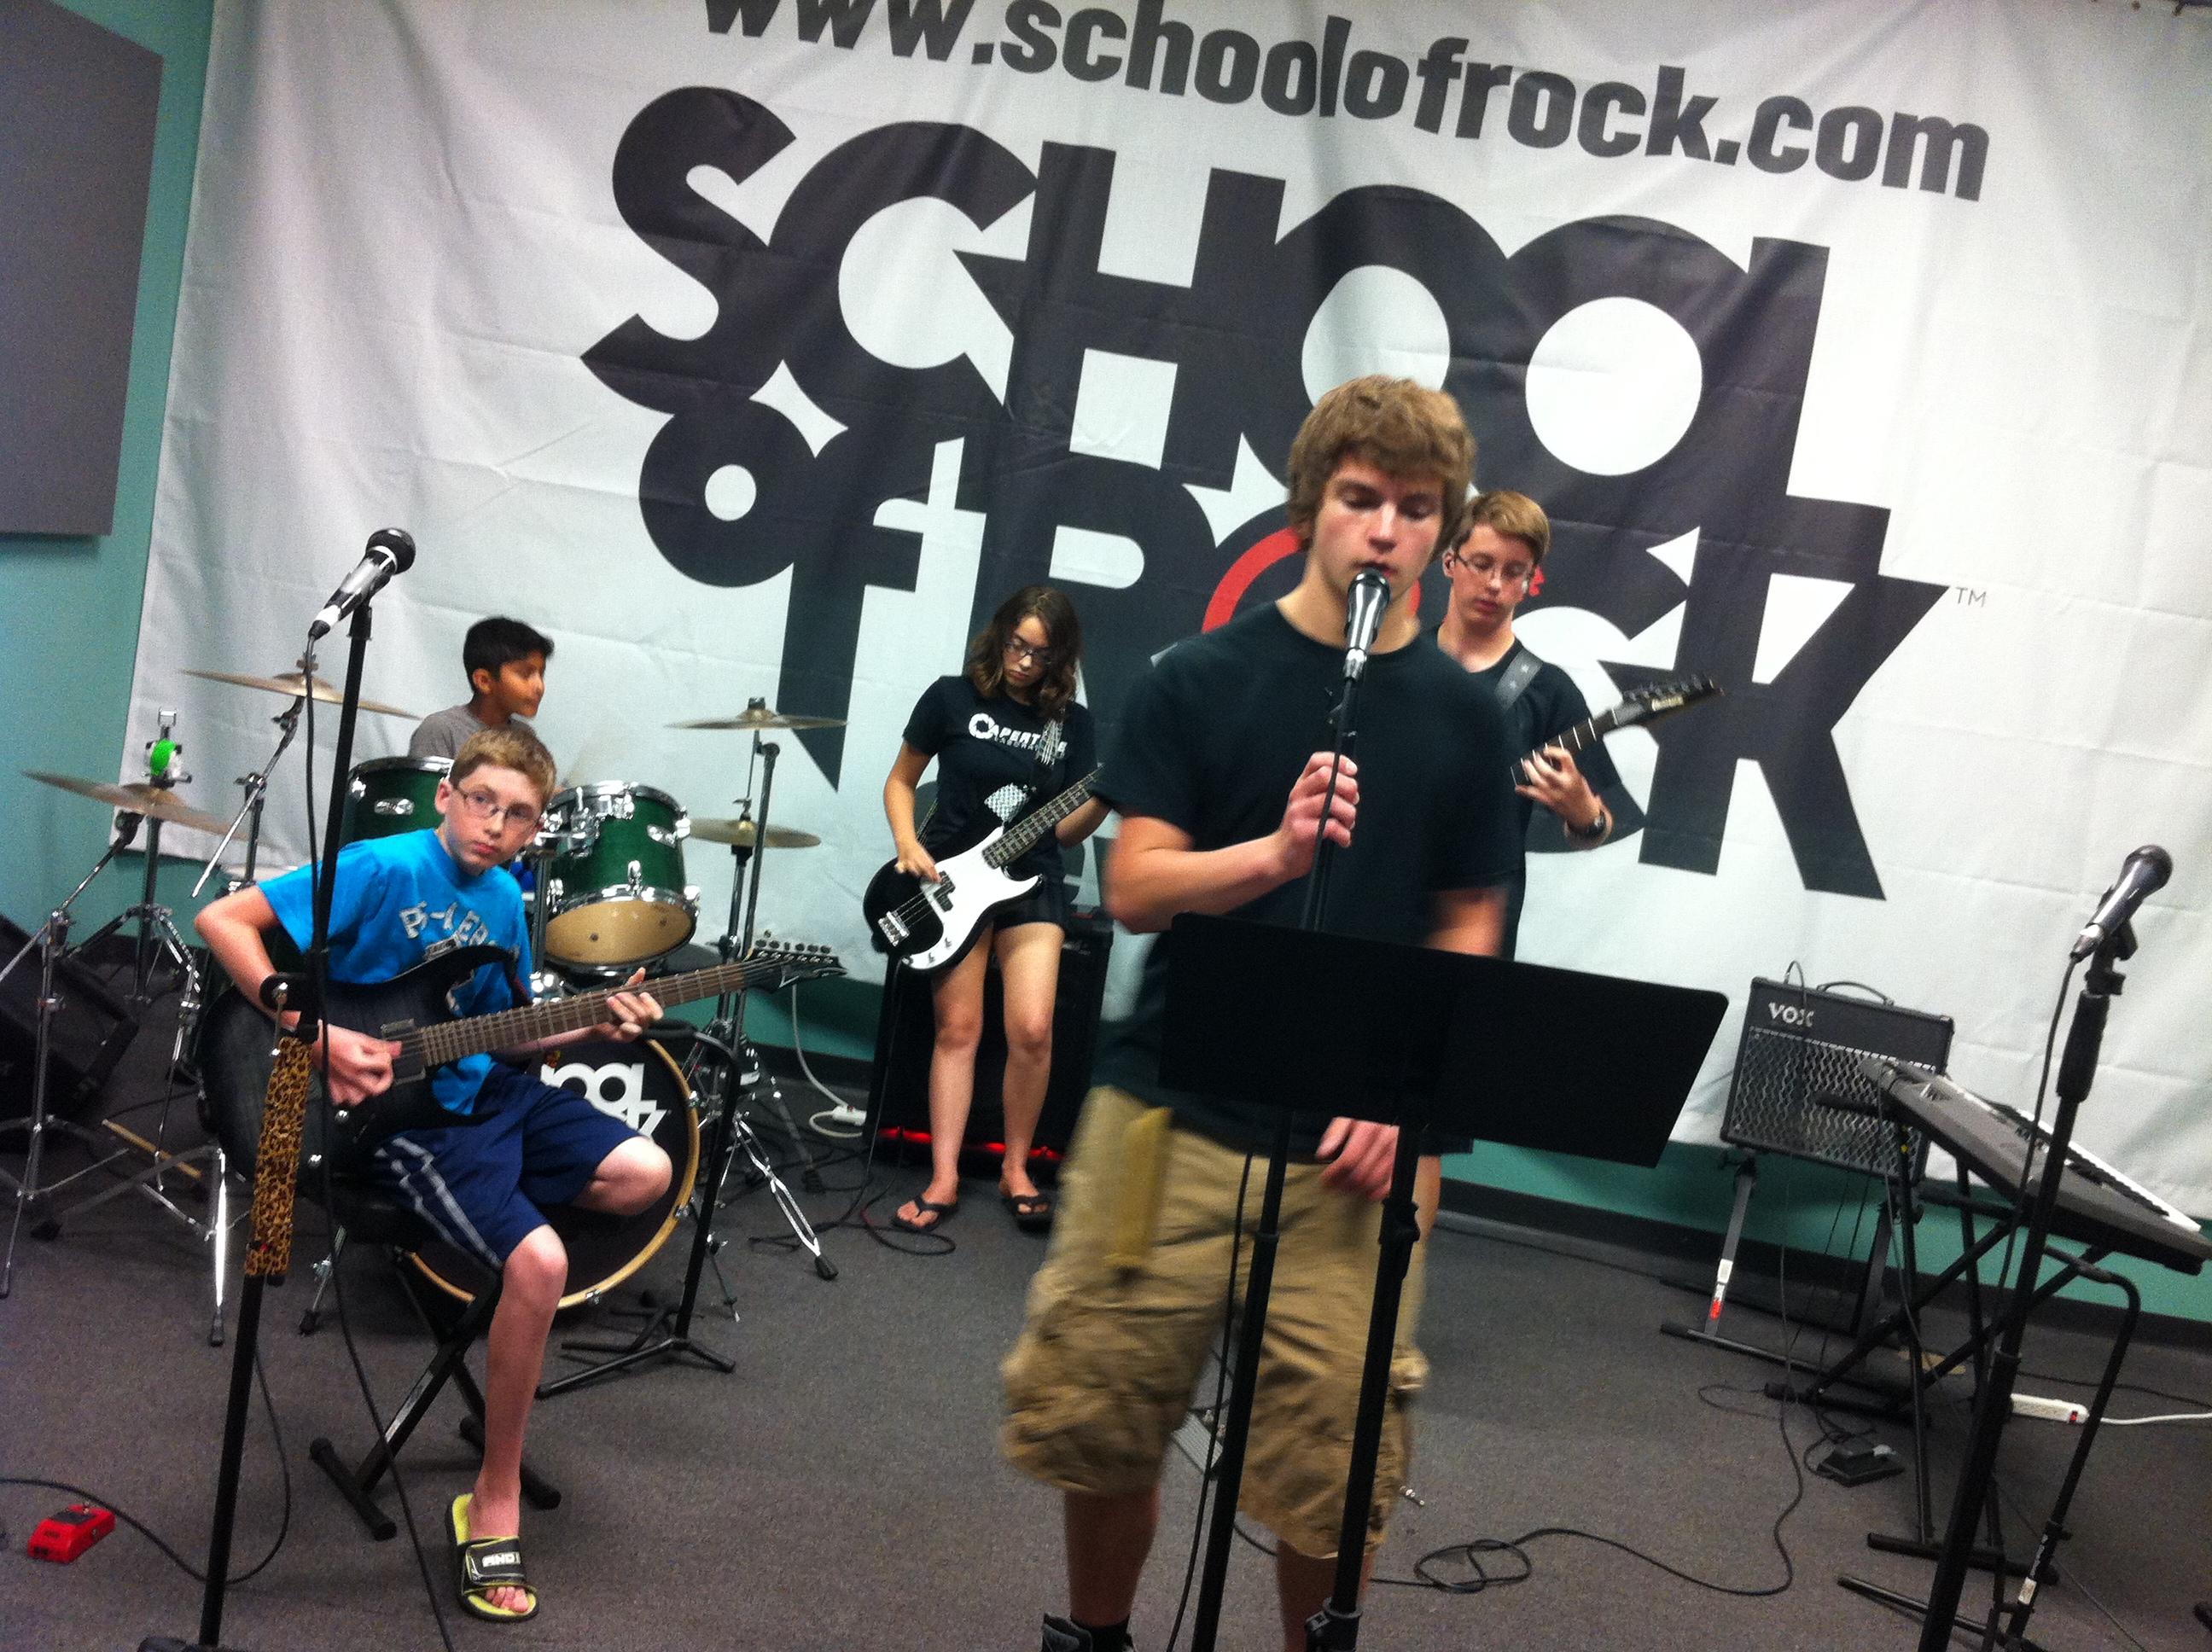 School of Rock Farmingdale image 7